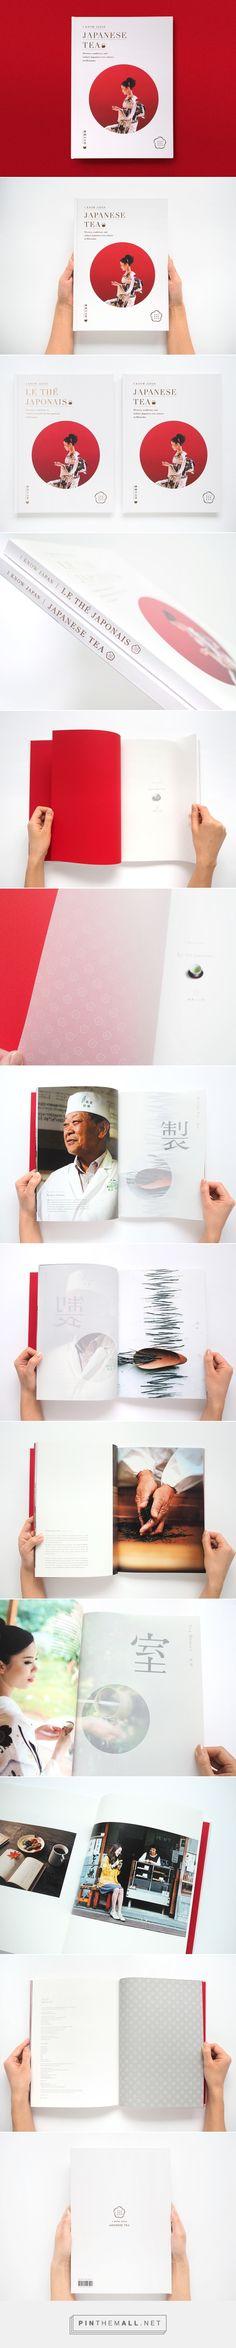 Japanese Tea by Masaomi Fujita